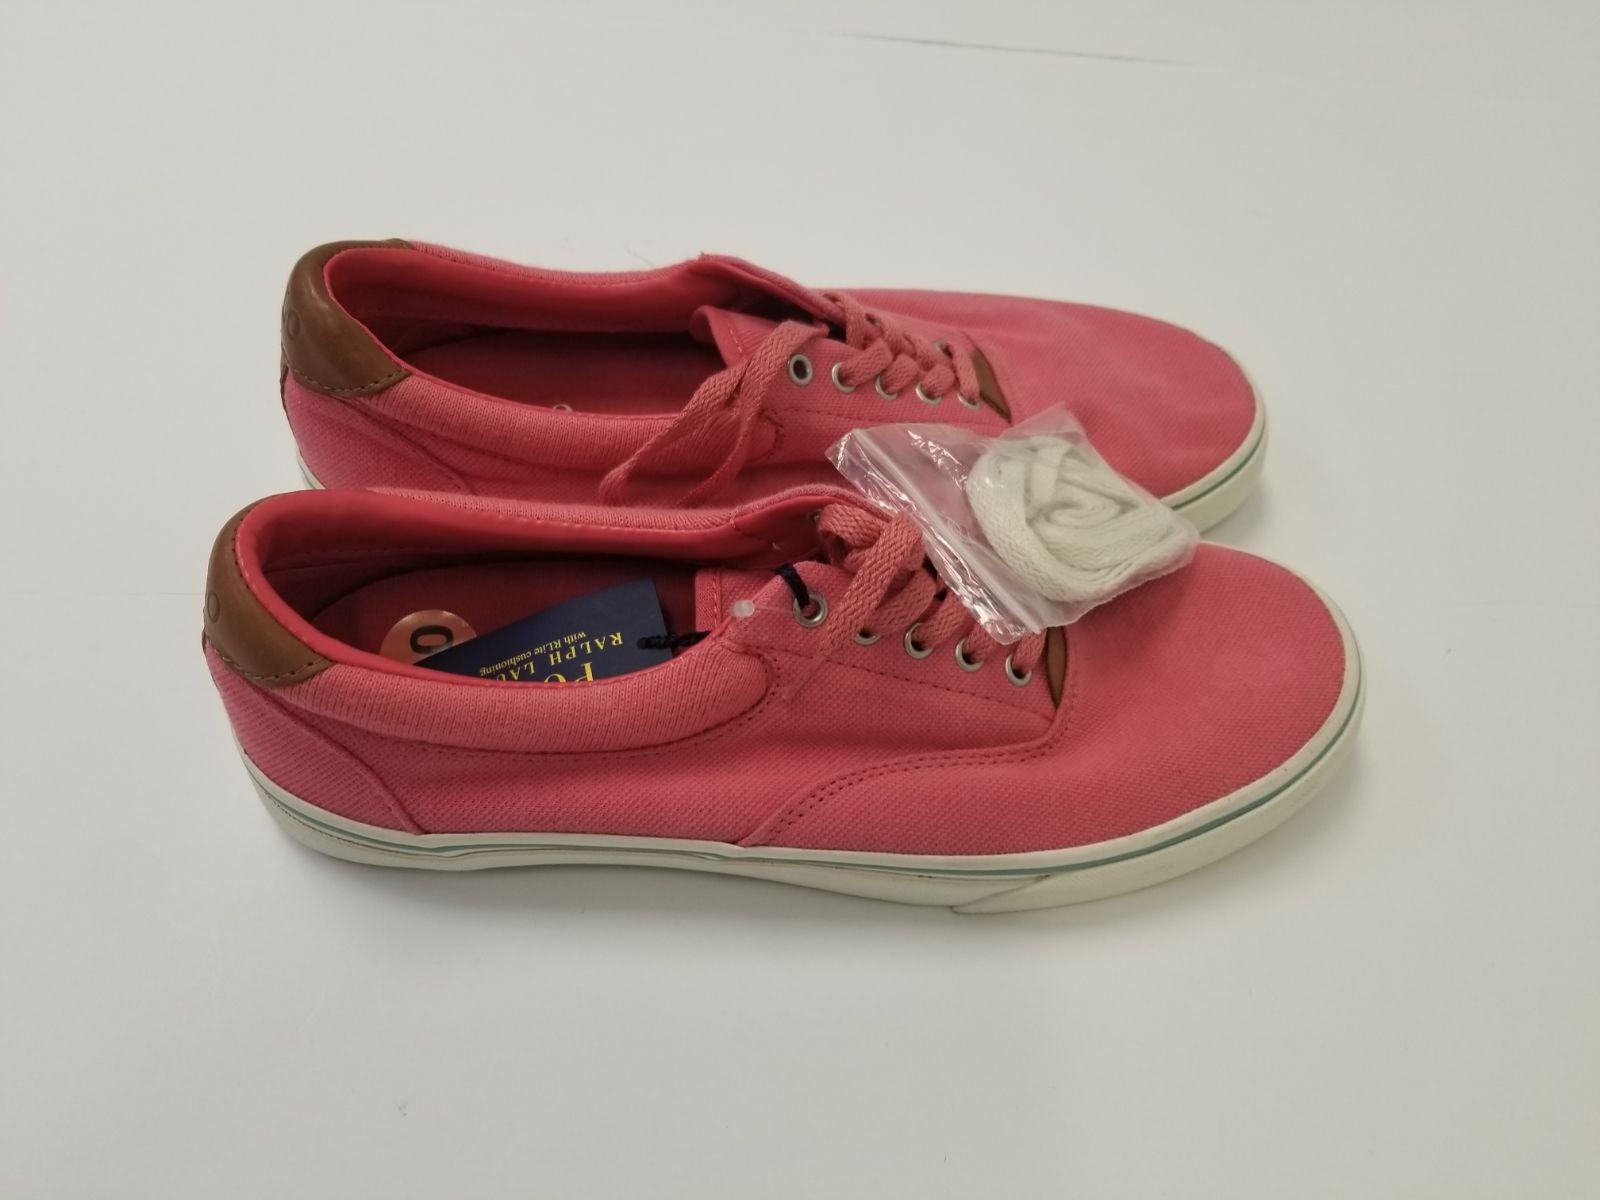 Polo Ralph Lauren Thorton II Canvas Shoe